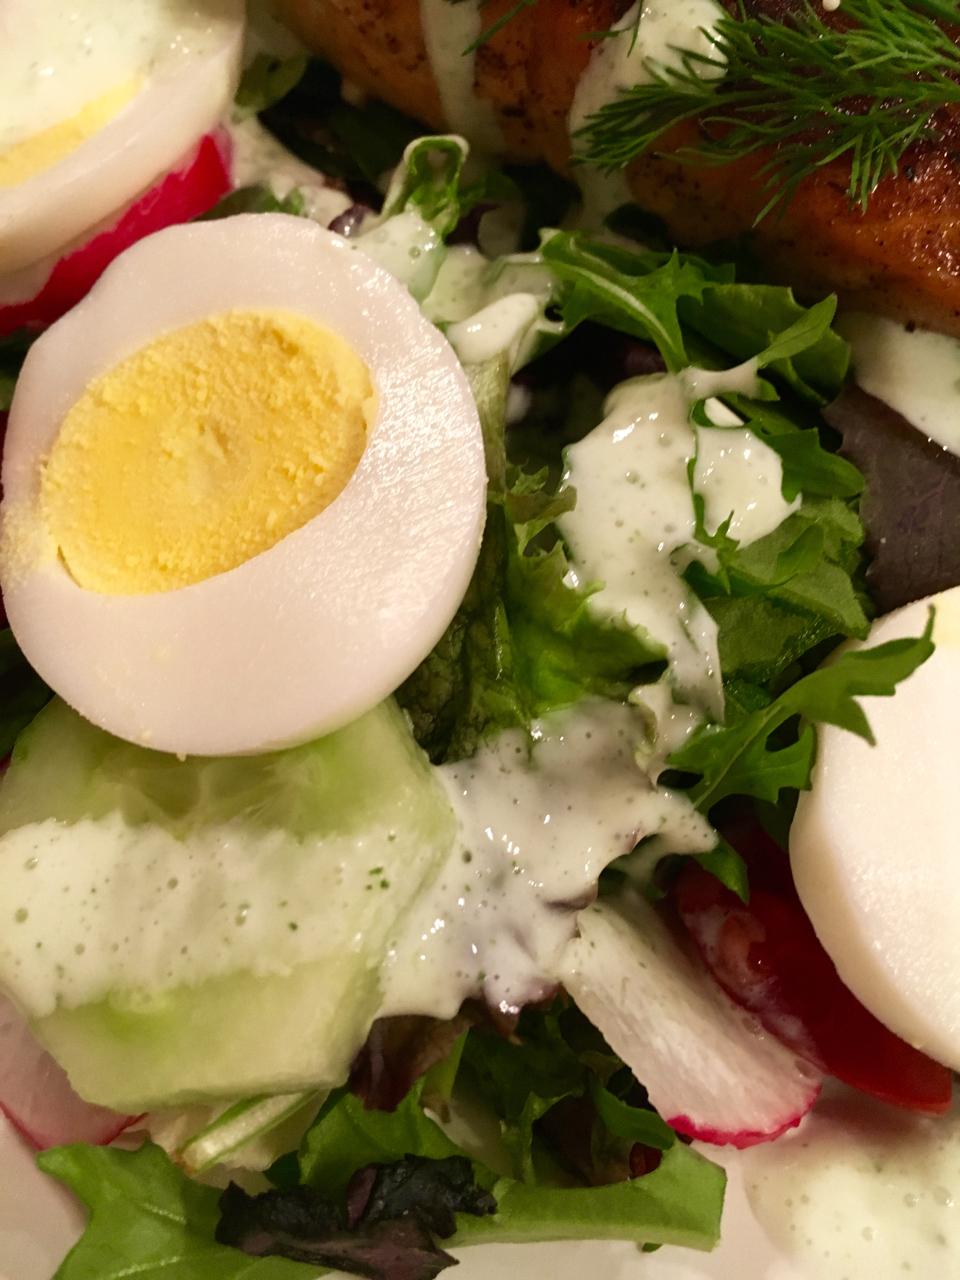 Blackened Salmon Salad With Greek Yogurt Dill Dressing